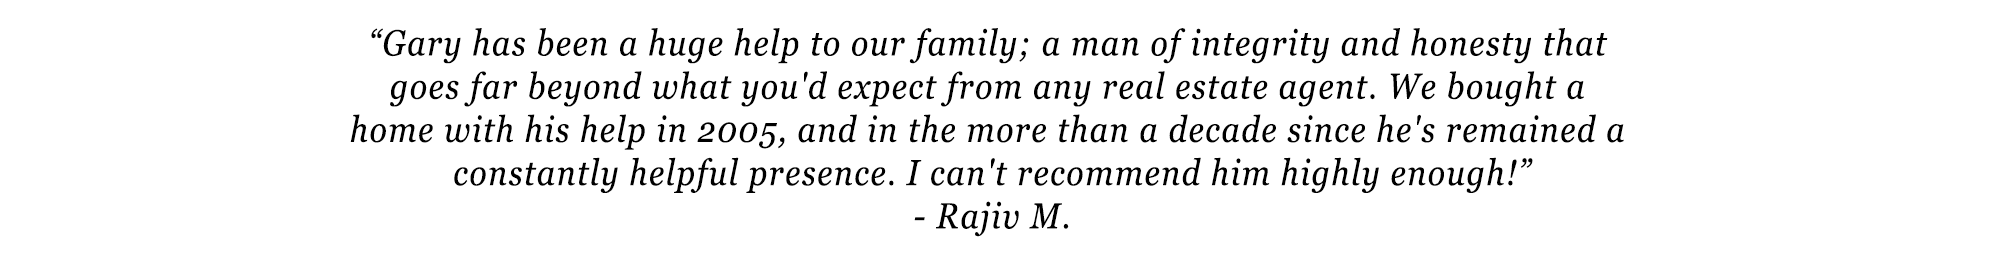 Rajiv M.png